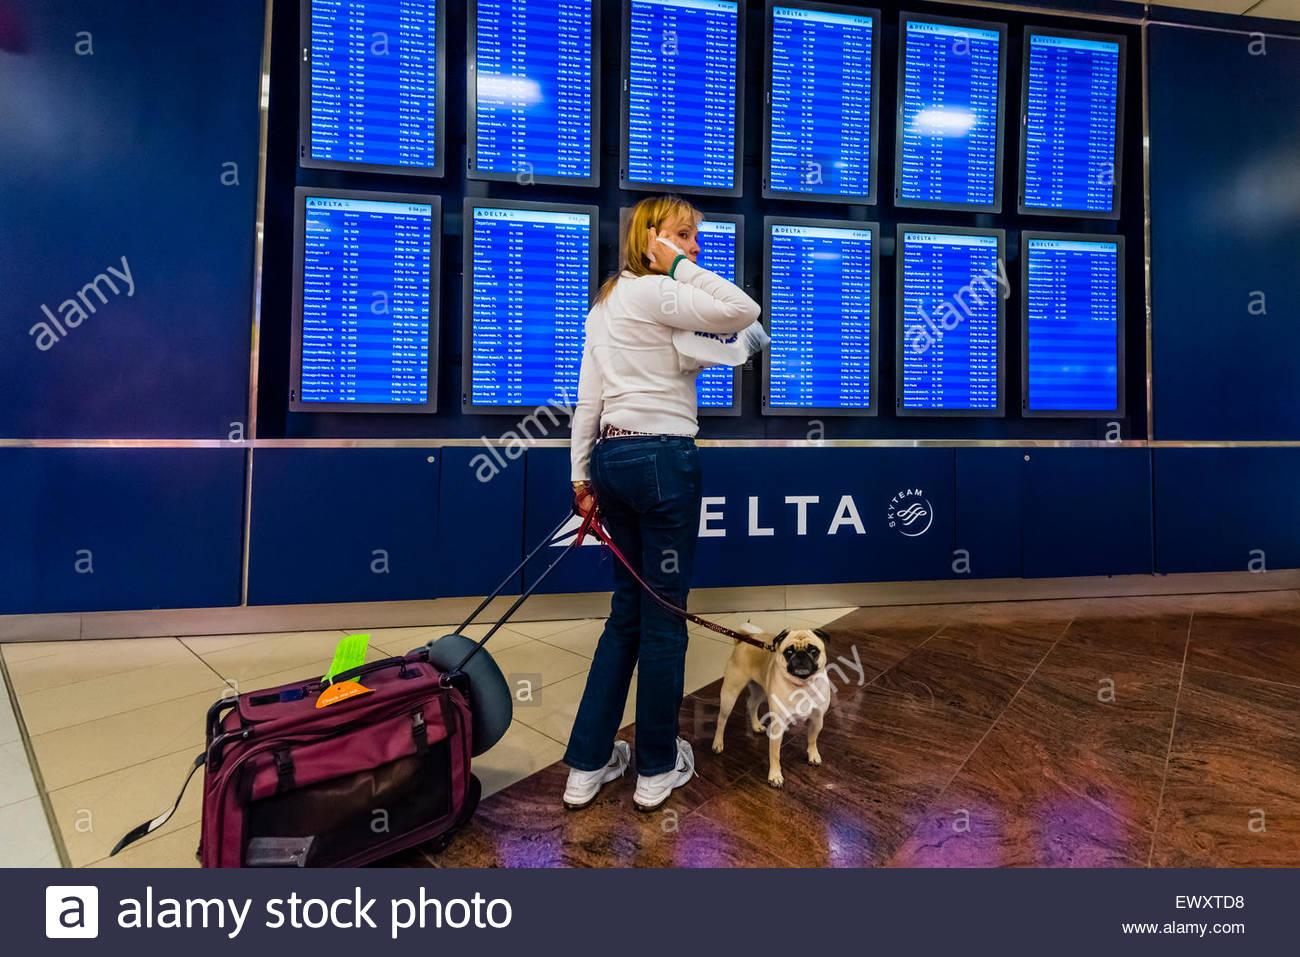 Flight departure screens, Hartsfield-Jackson Atlanta International Airport, Atlanta, Georgia USA. - Stock Image